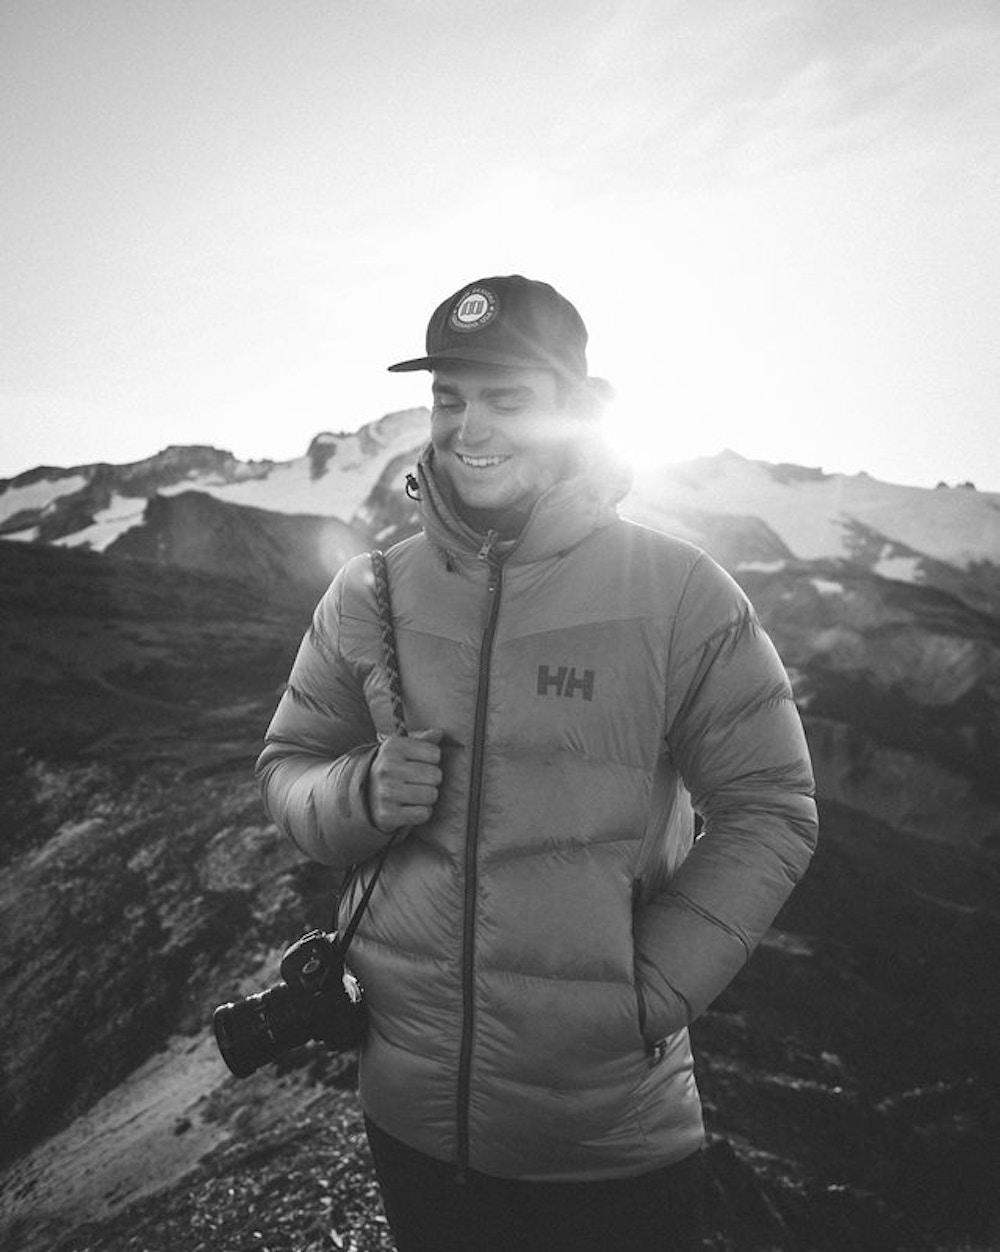 Michael - Michael Overbeck | Adventure Photographer